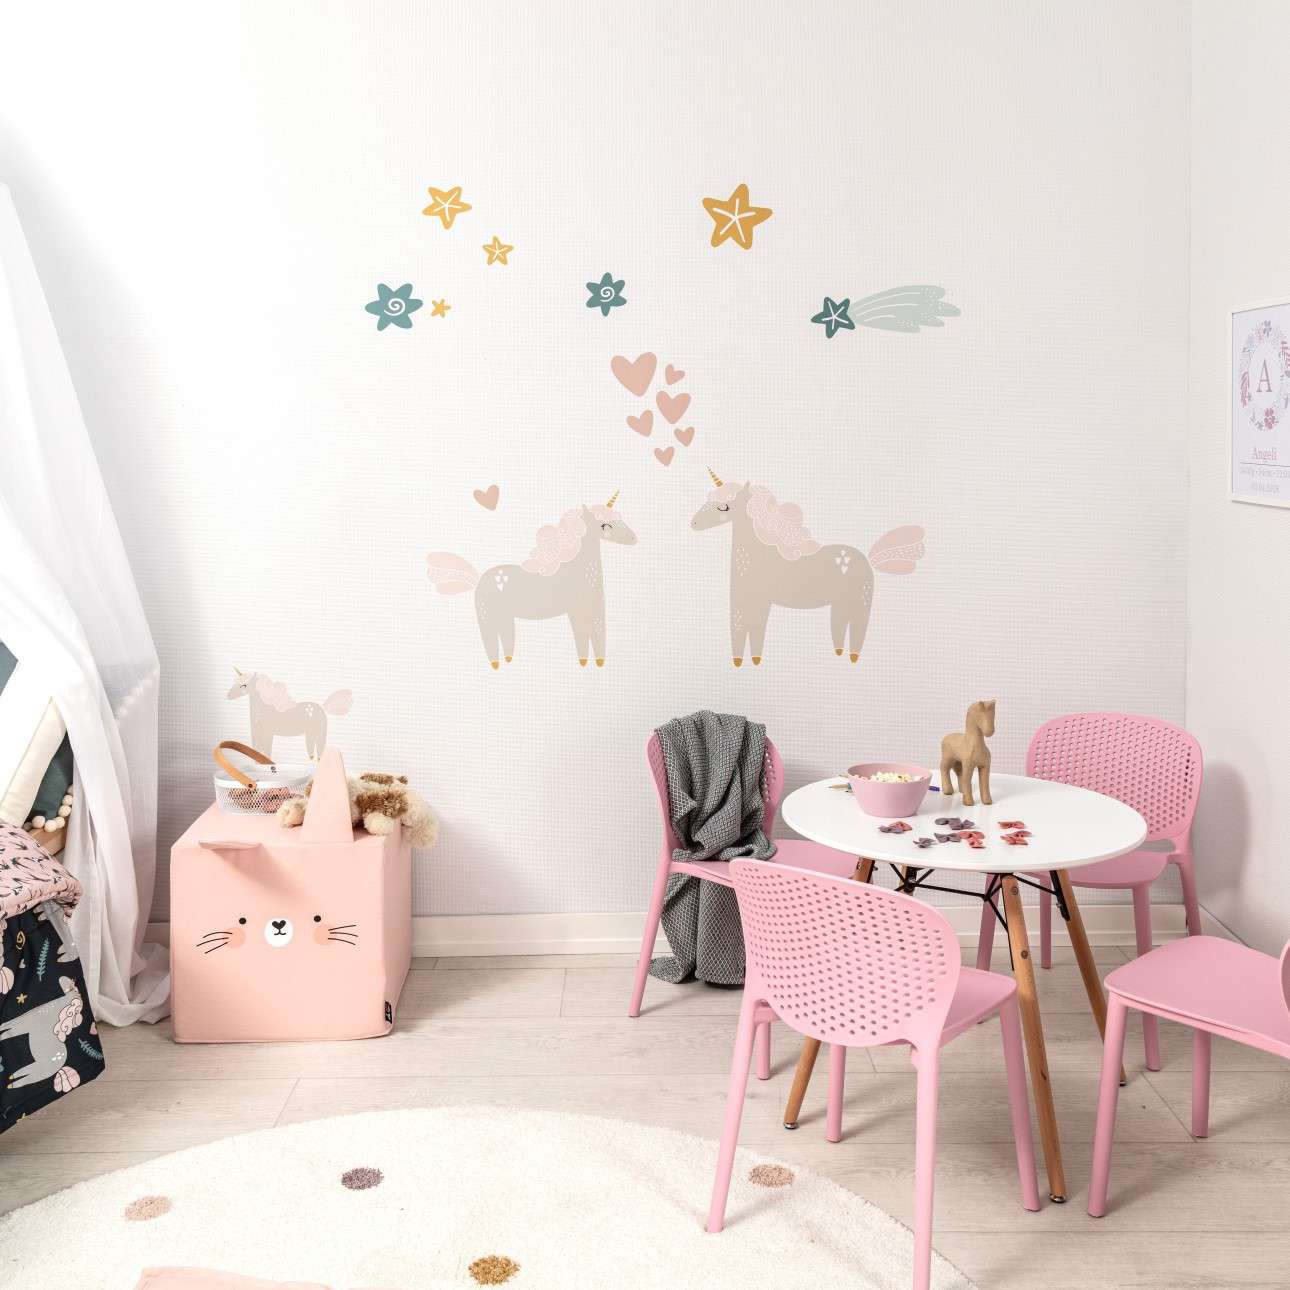 Aufkleber-Set Lovely Unicorn